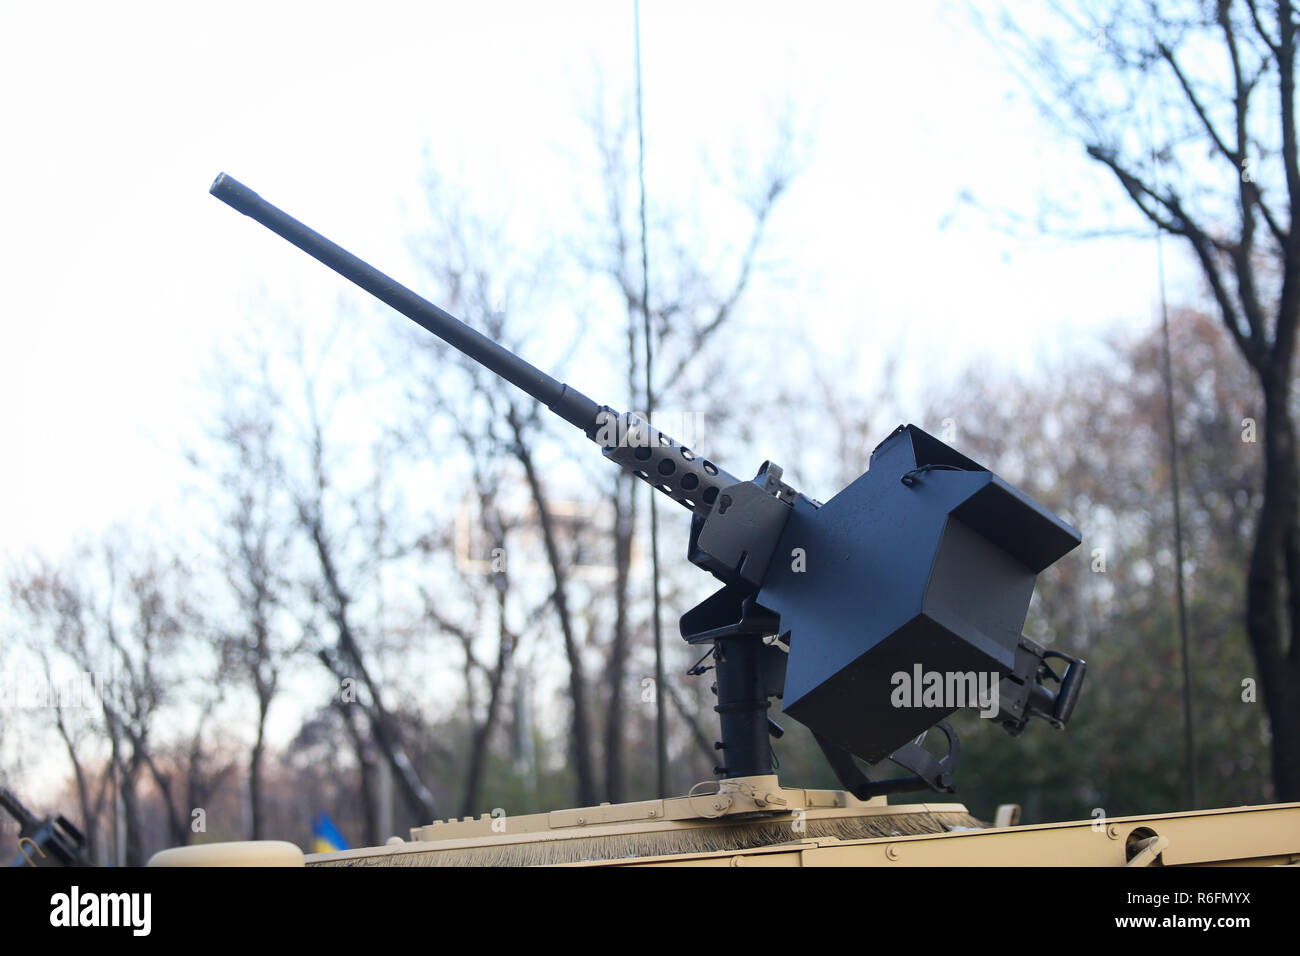 50 cal machine gun mounted on a Humvee military vehicle - Stock Image